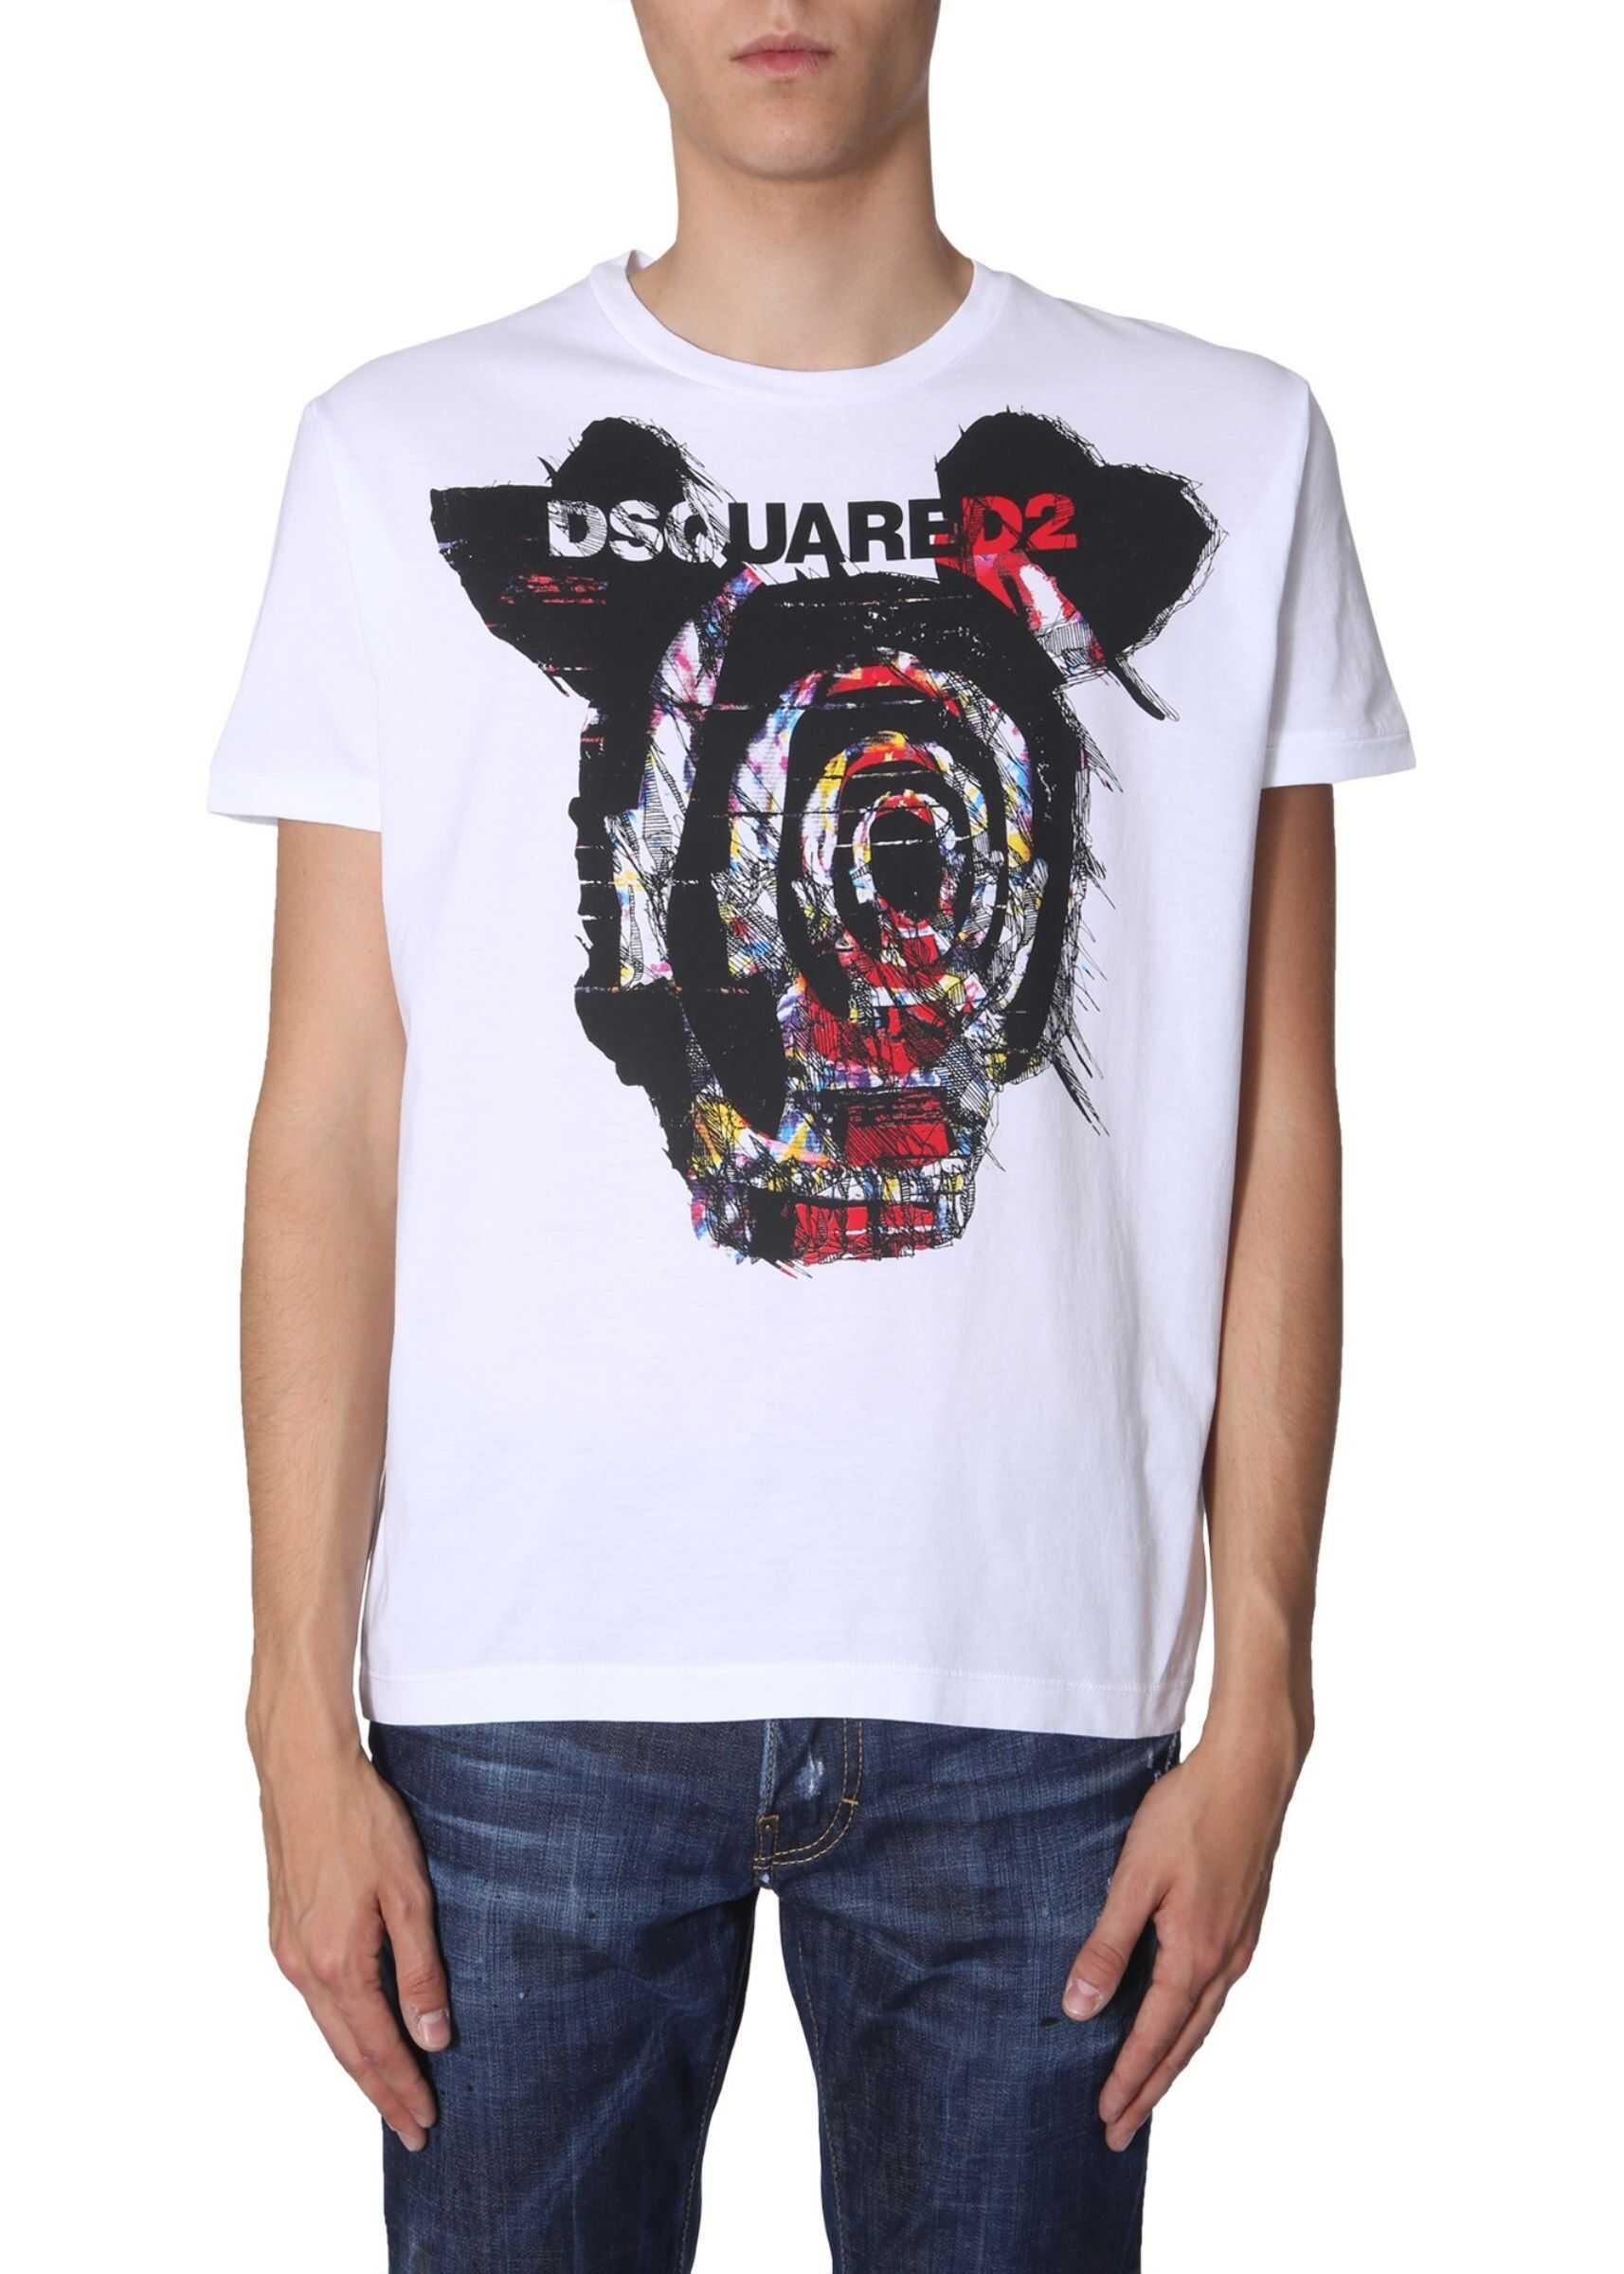 DSQUARED2 Printed T -Shirt WHITE